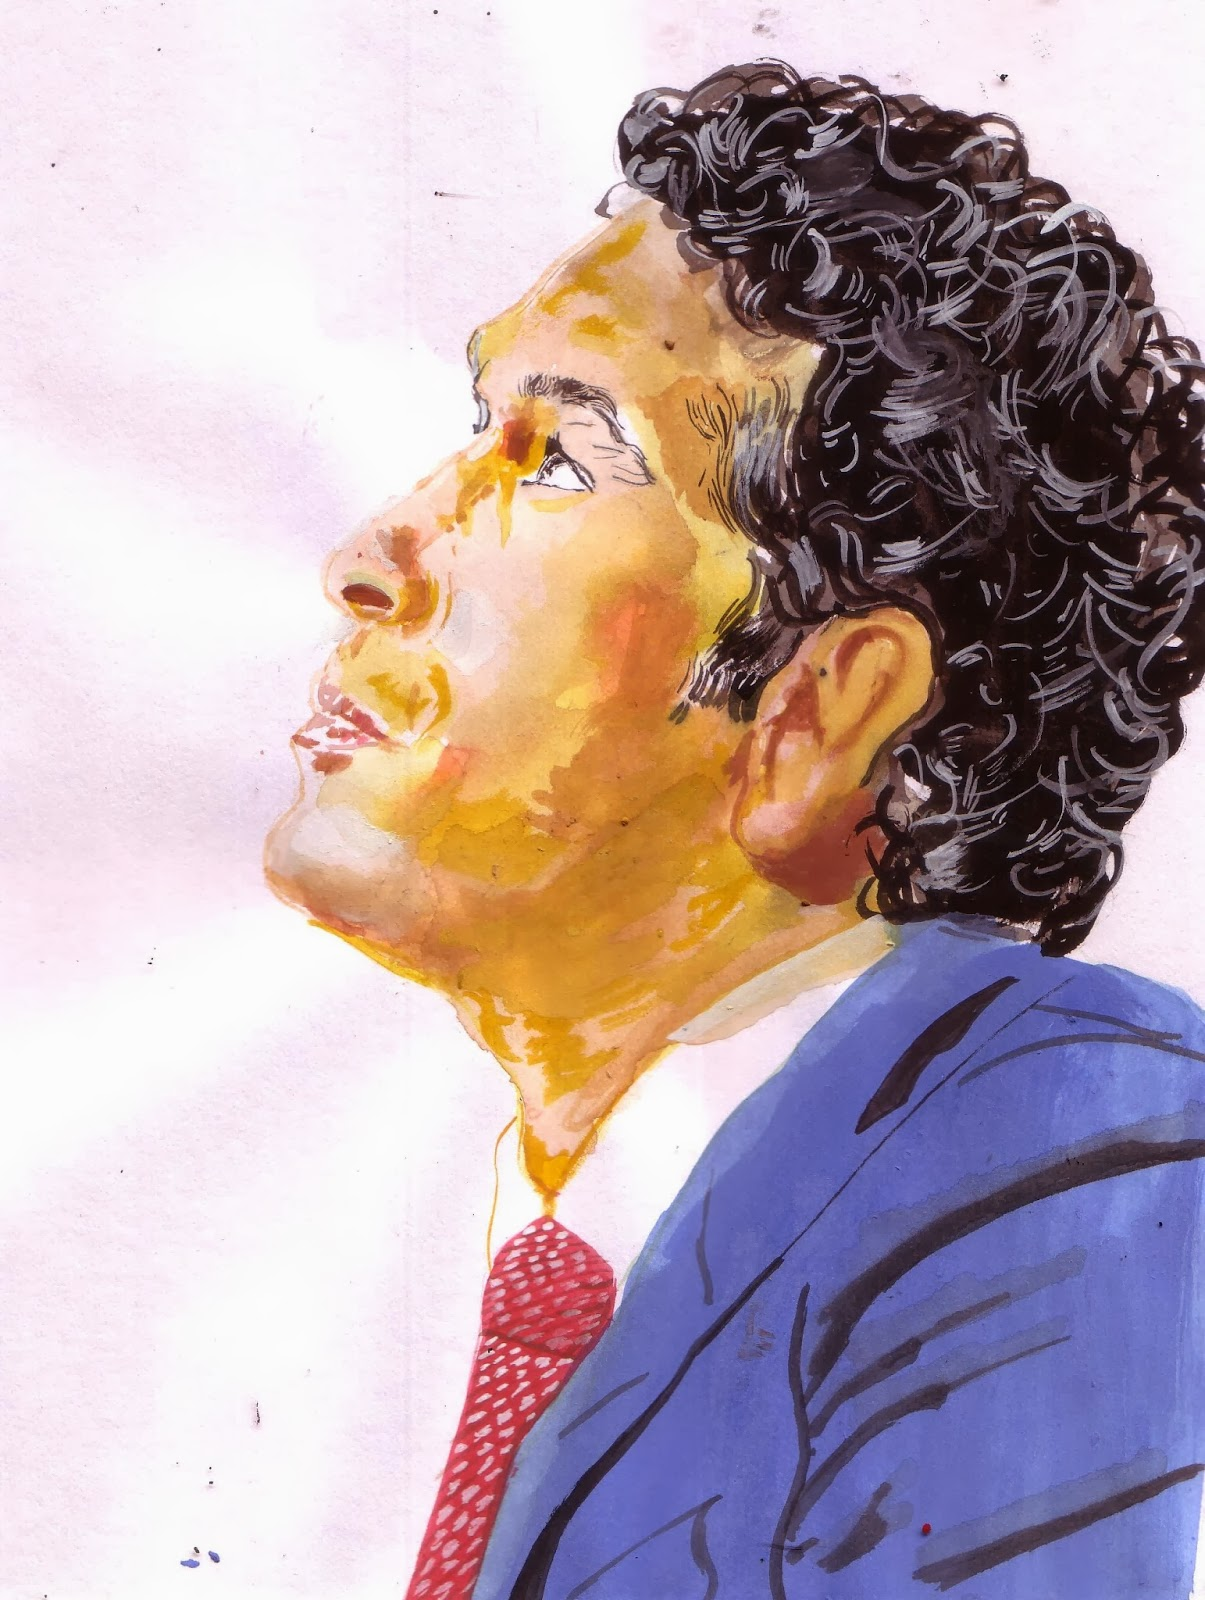 Sachin Tendulkar, Image courtesy artist